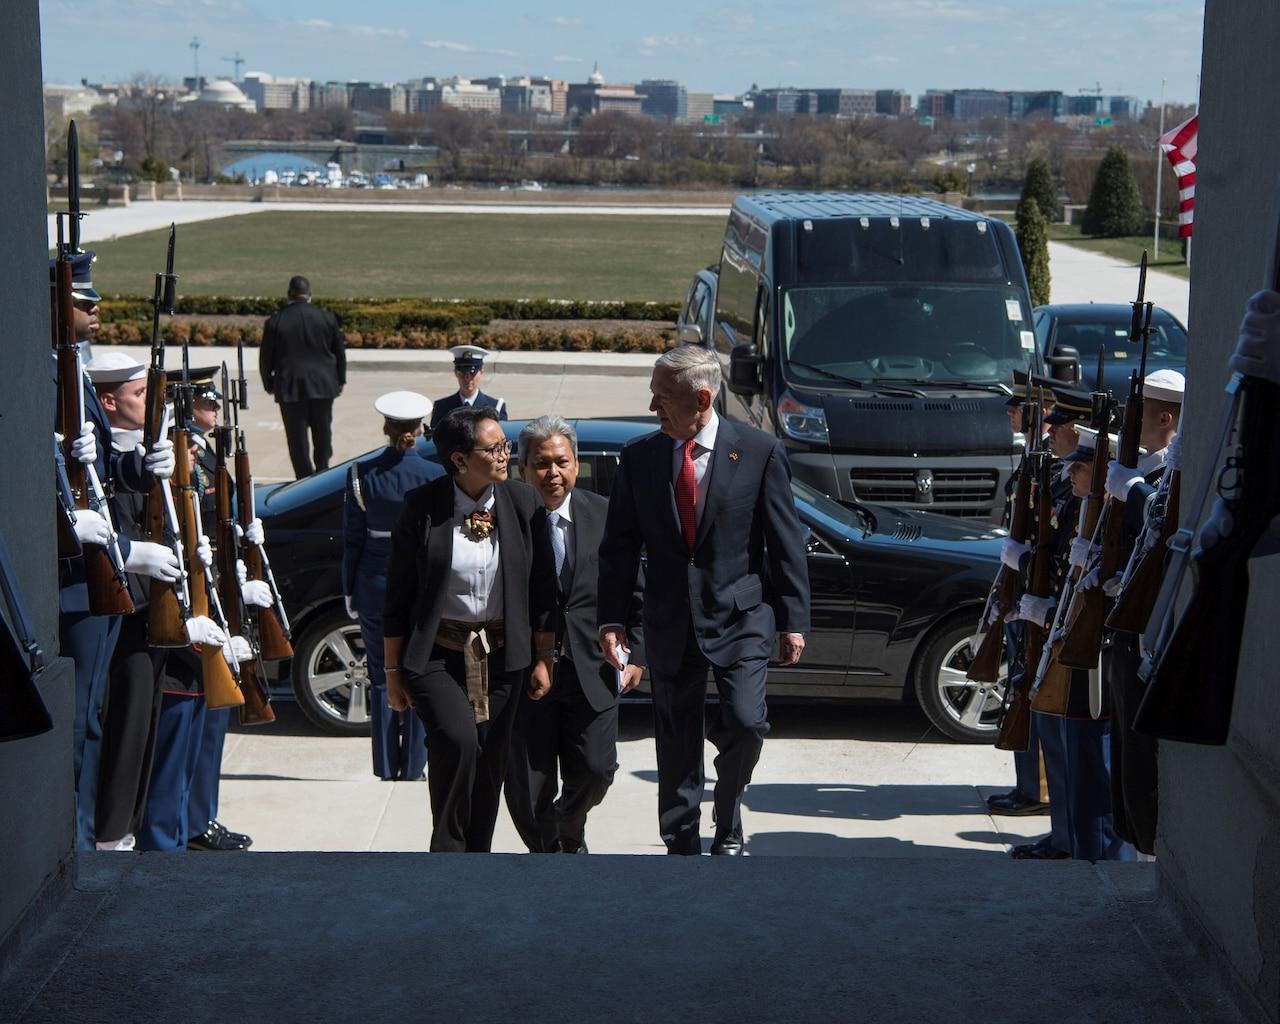 Defense Secretary James N. Mattis, right, and Indonesian Foreign Minister Retno Marsudi enter the Pentagon.